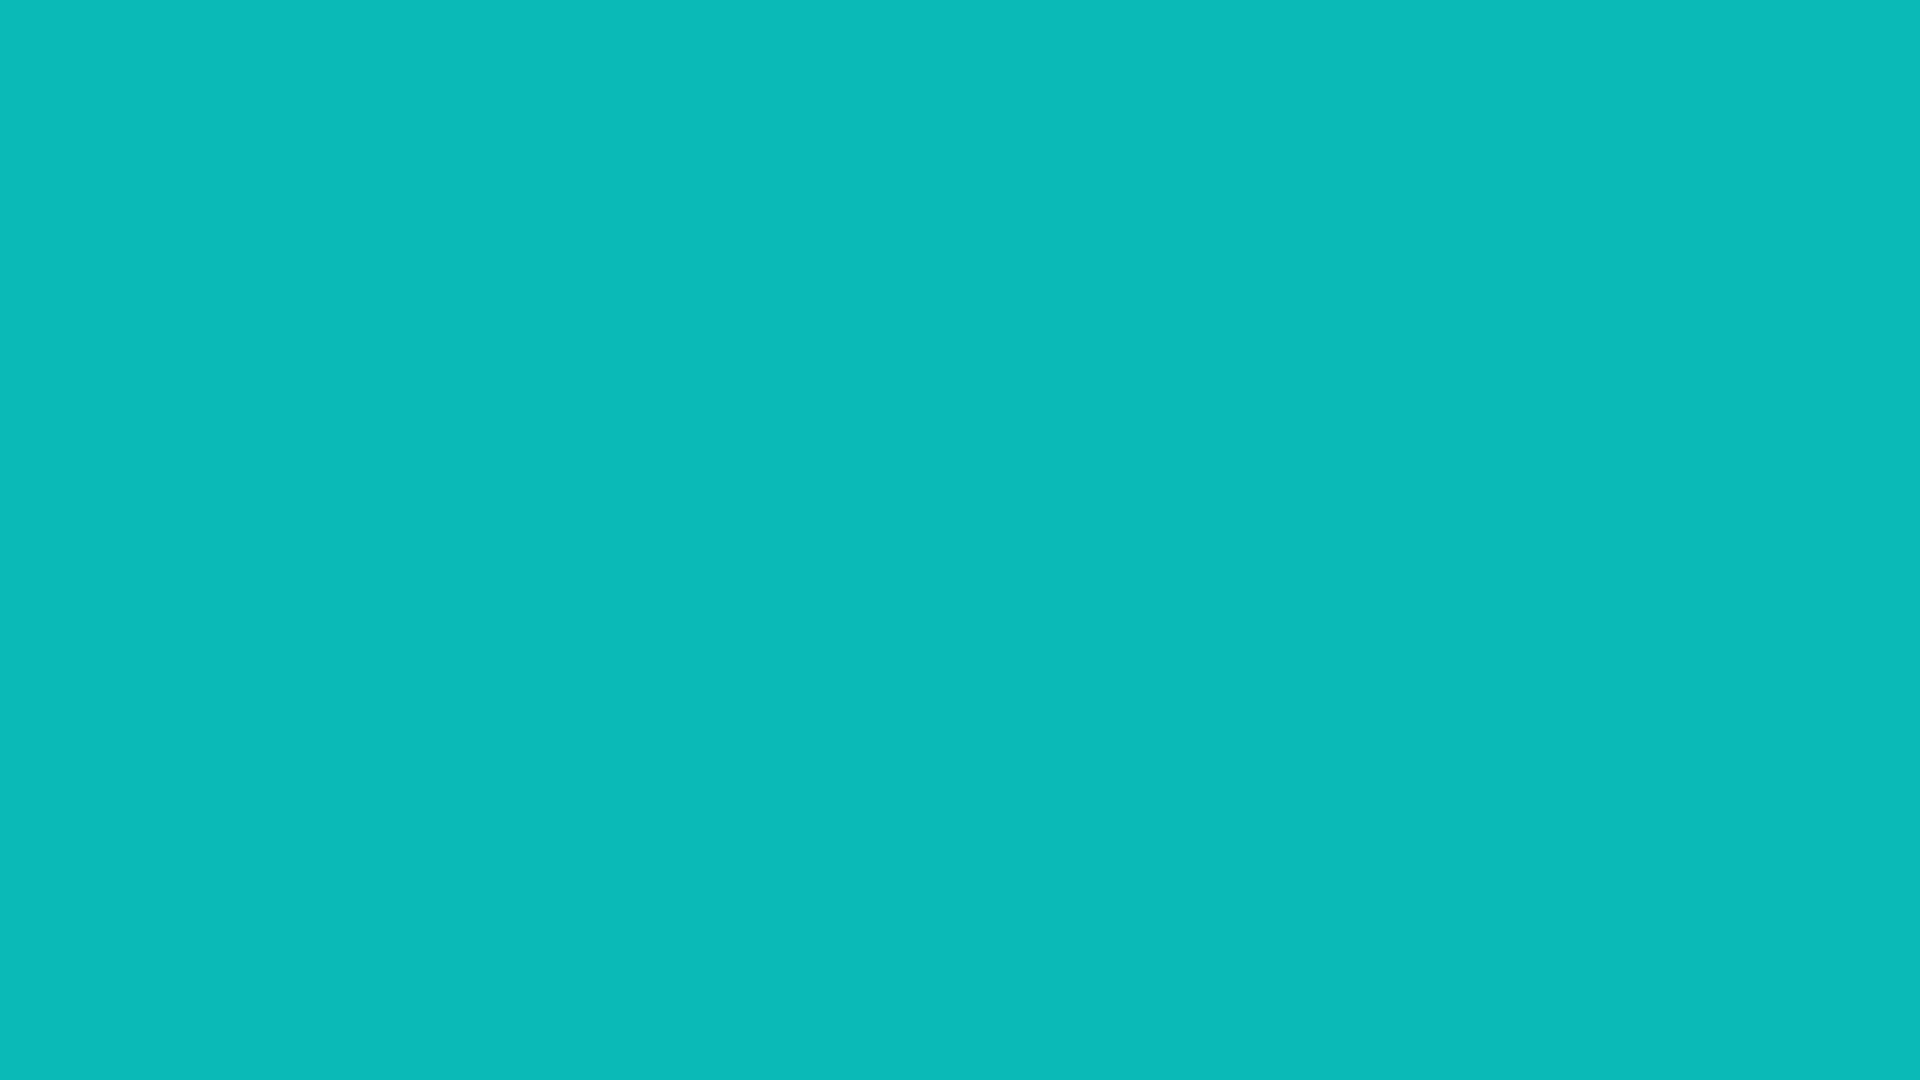 Tiffany Blue Color Code >> Tiffany Blue Wallpaper - WallpaperSafari